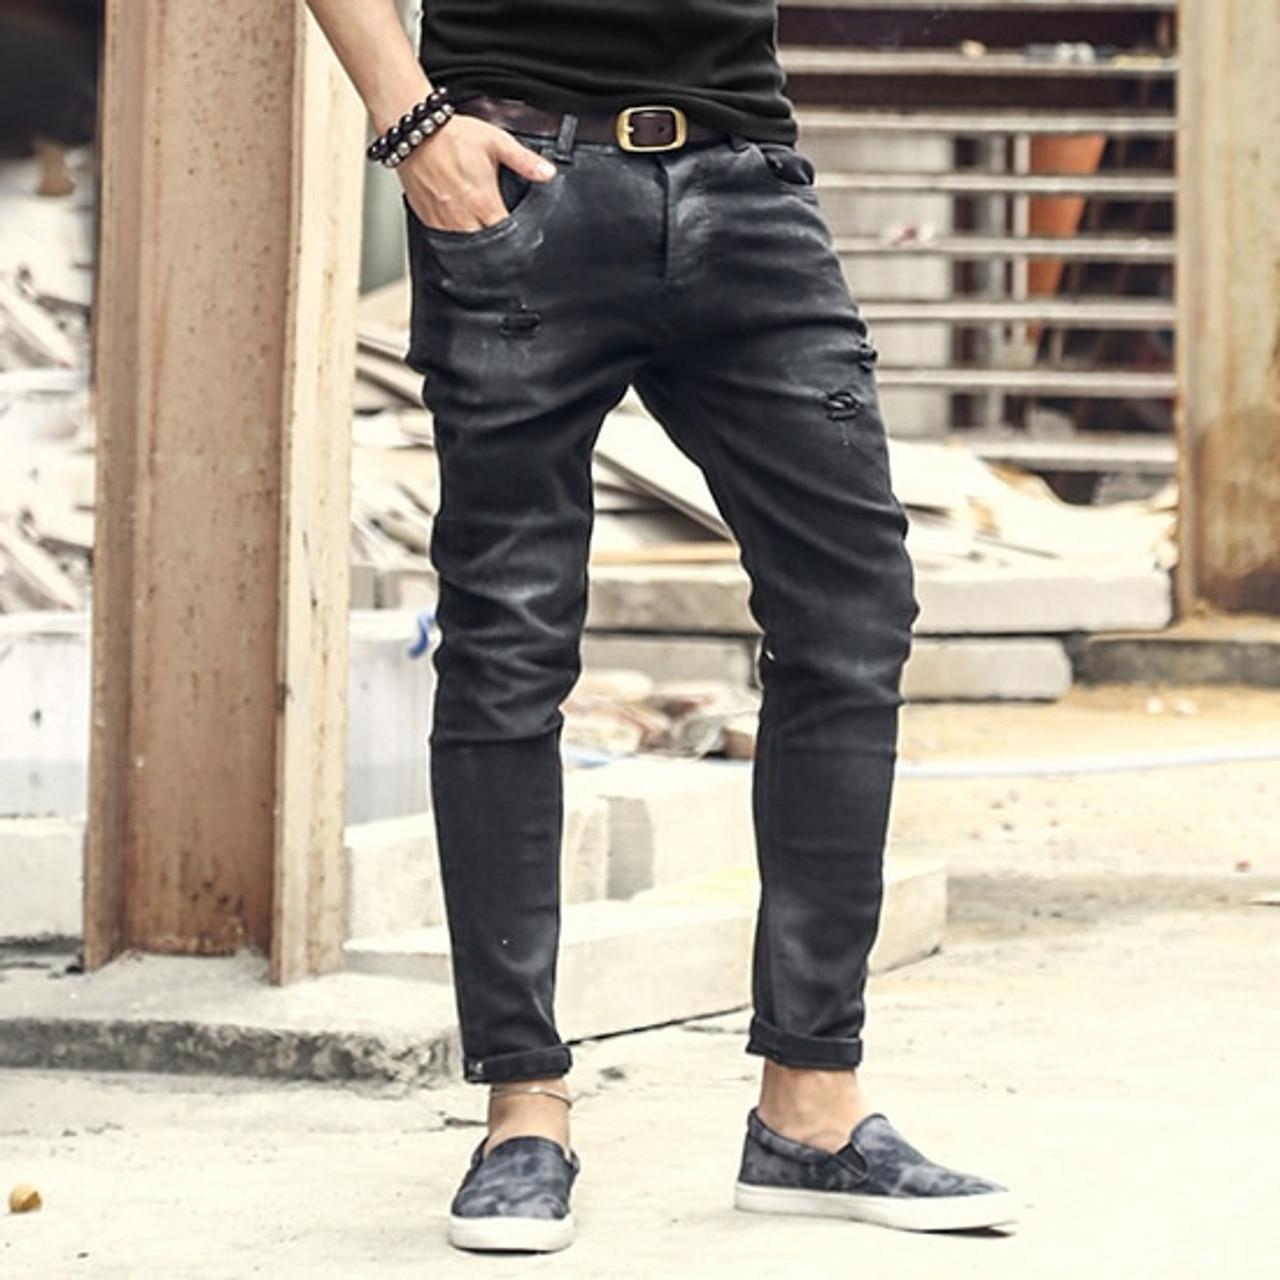 Fashion Vintage Mens Ripped Jeans Pants Slim Fit Distressed Hip Hop Denim Pants New Spring Men Black Stretch Jeans Pants Onshopdeals Com